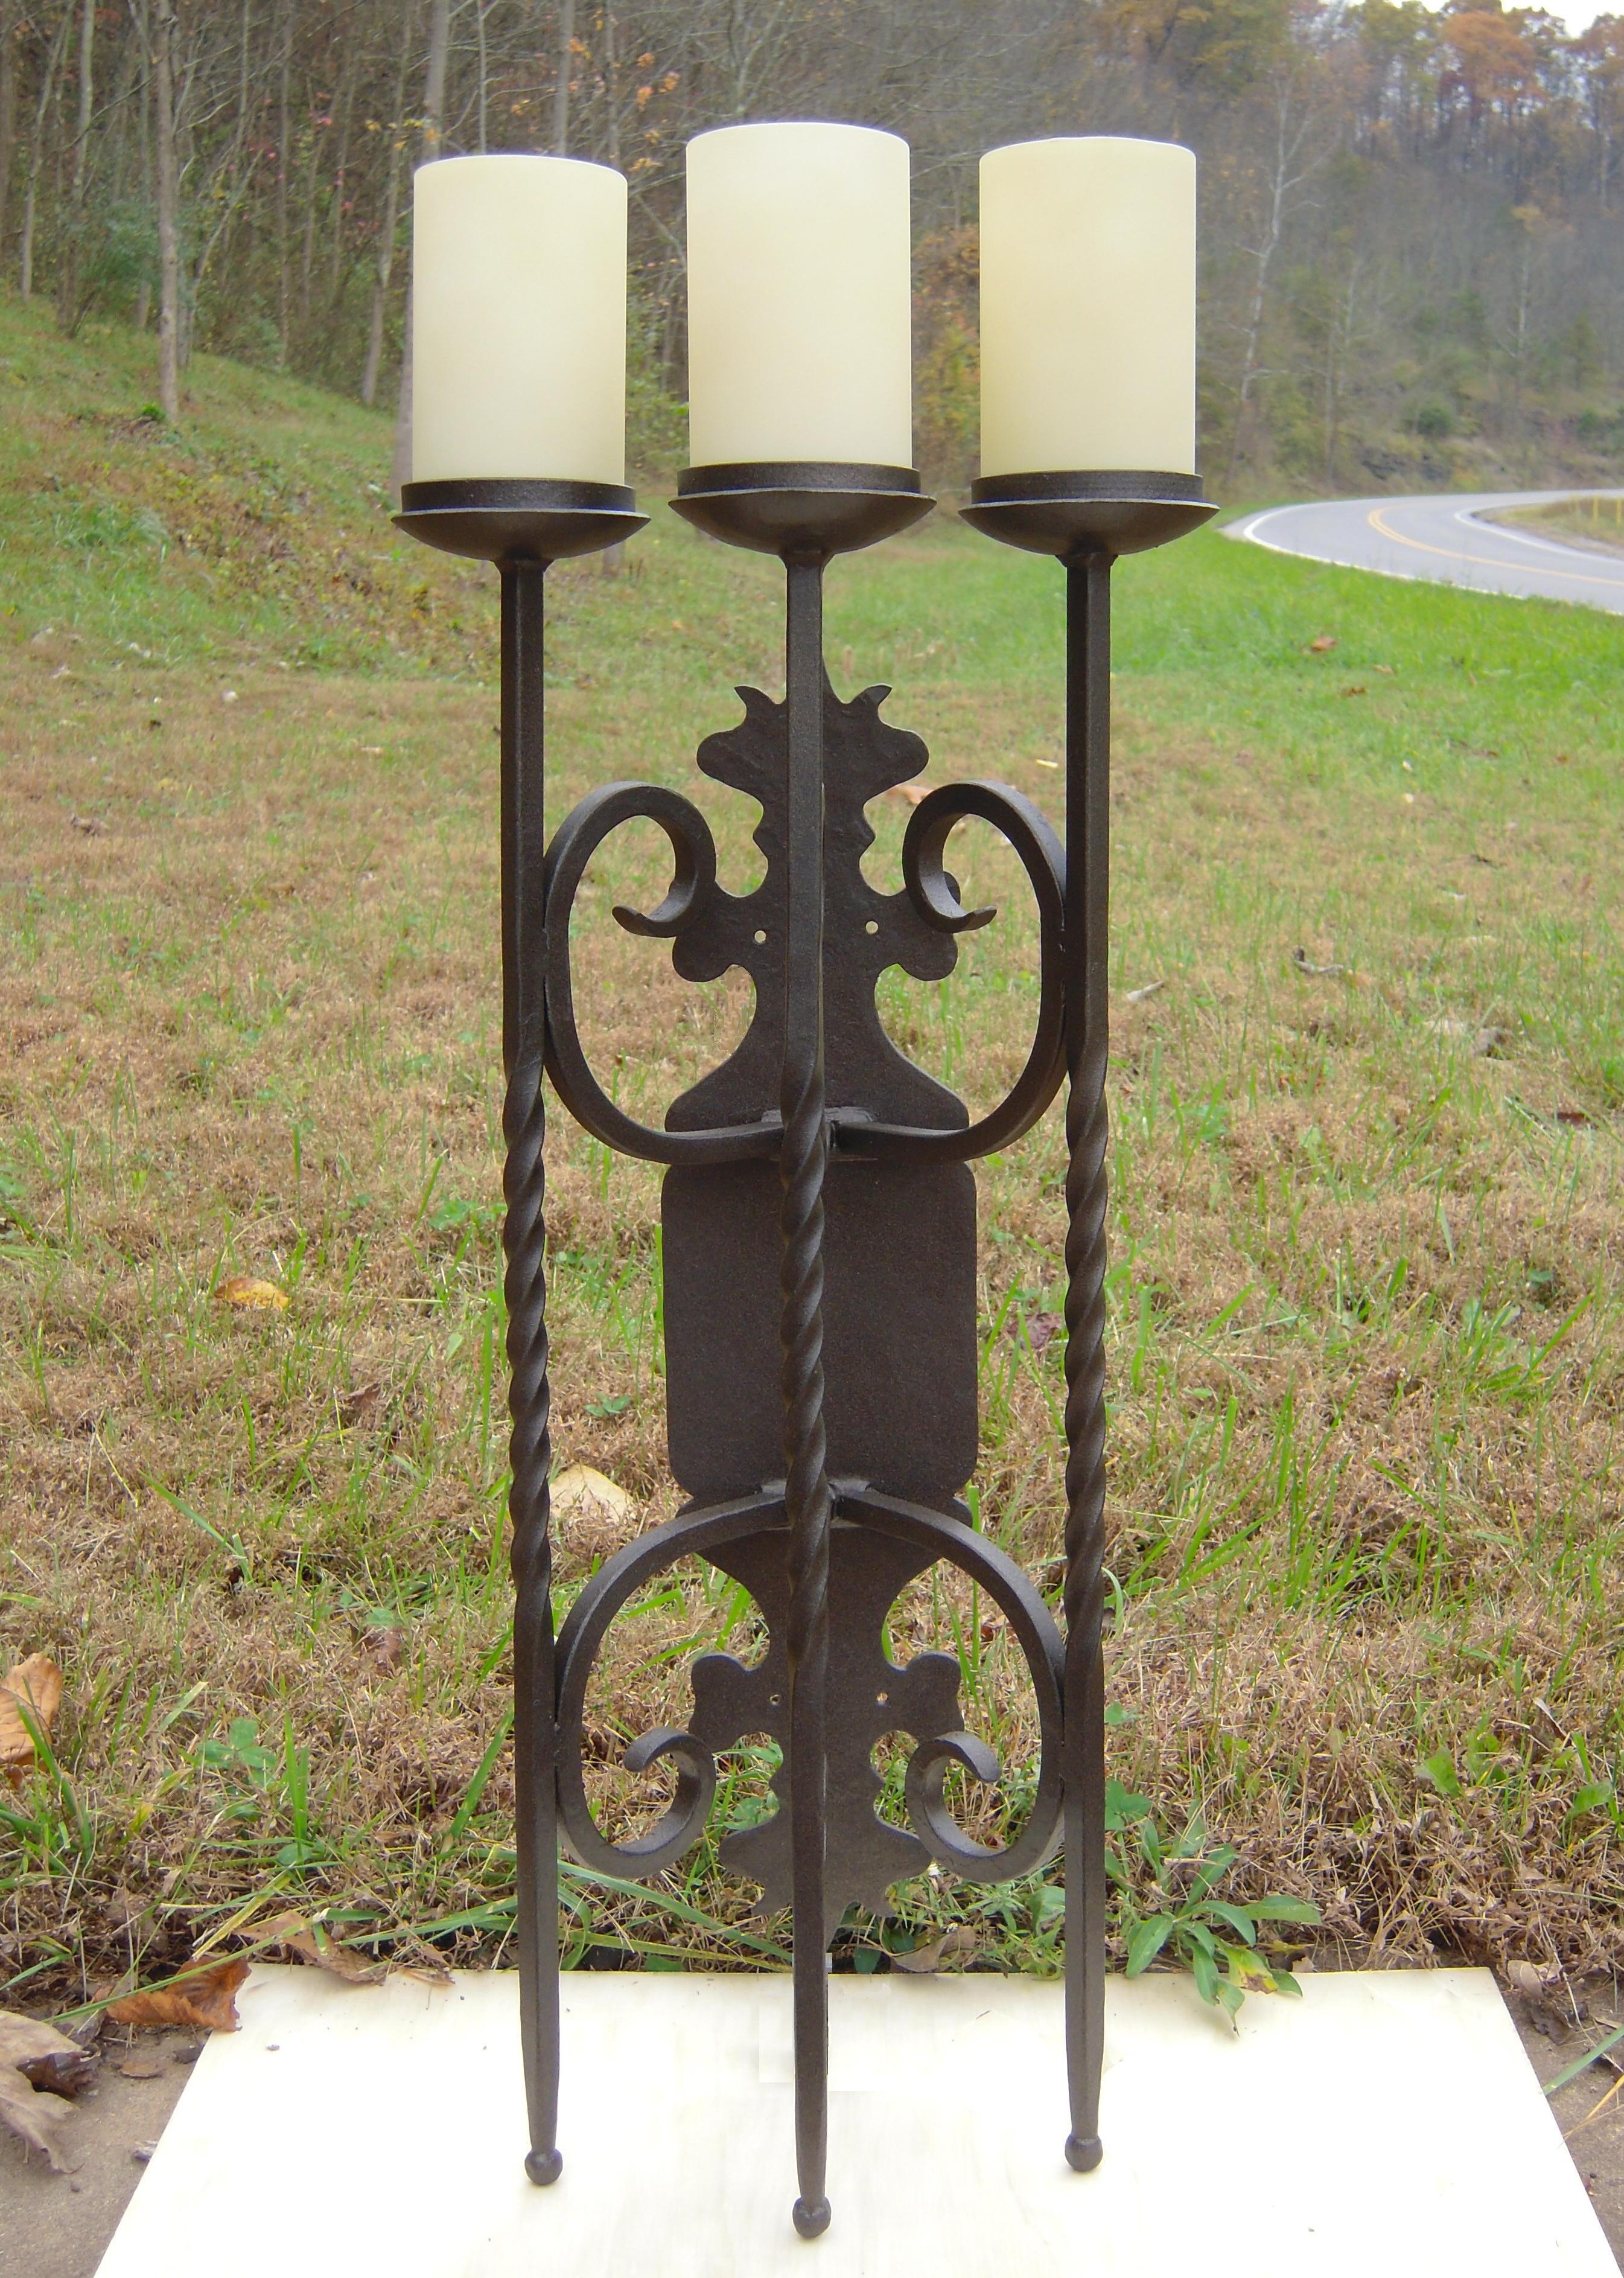 Decorative Sconce Light